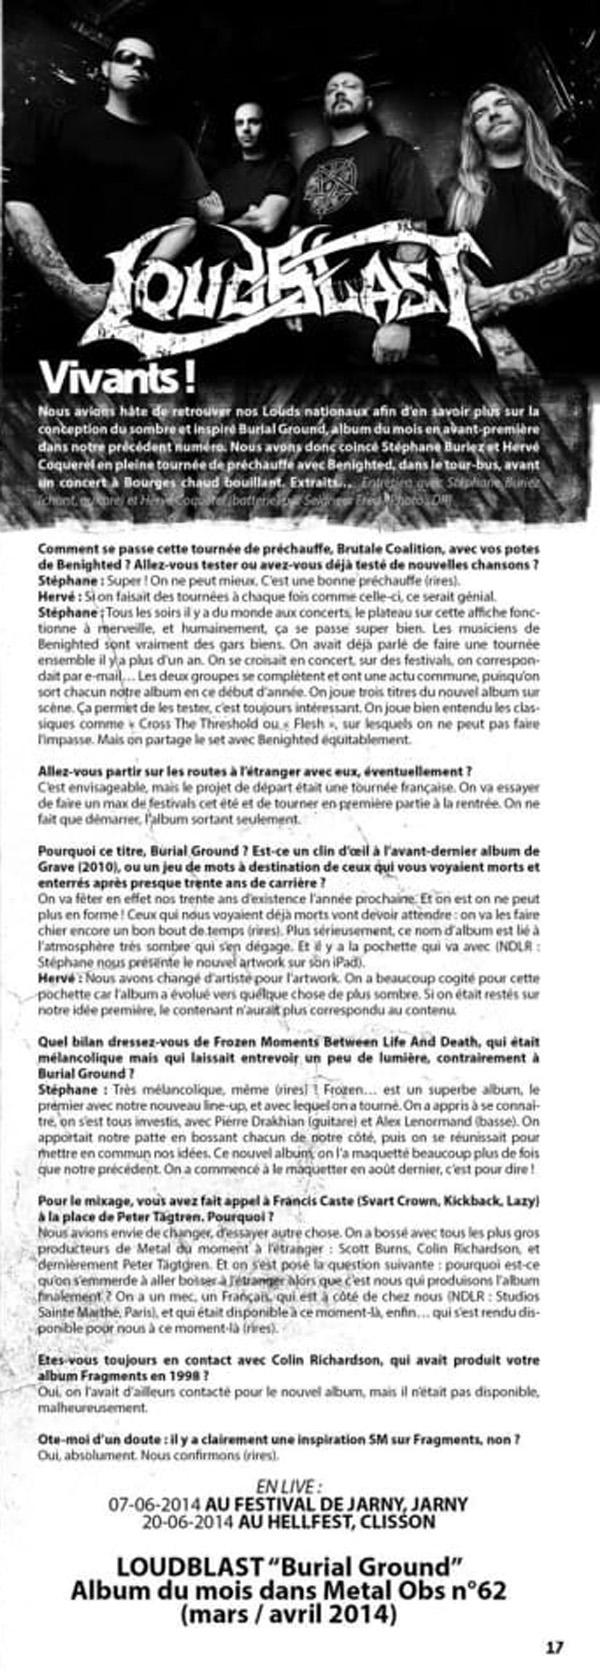 LOUDBLAST dans METALOBS n°63 (Archive de 2014) 19025011